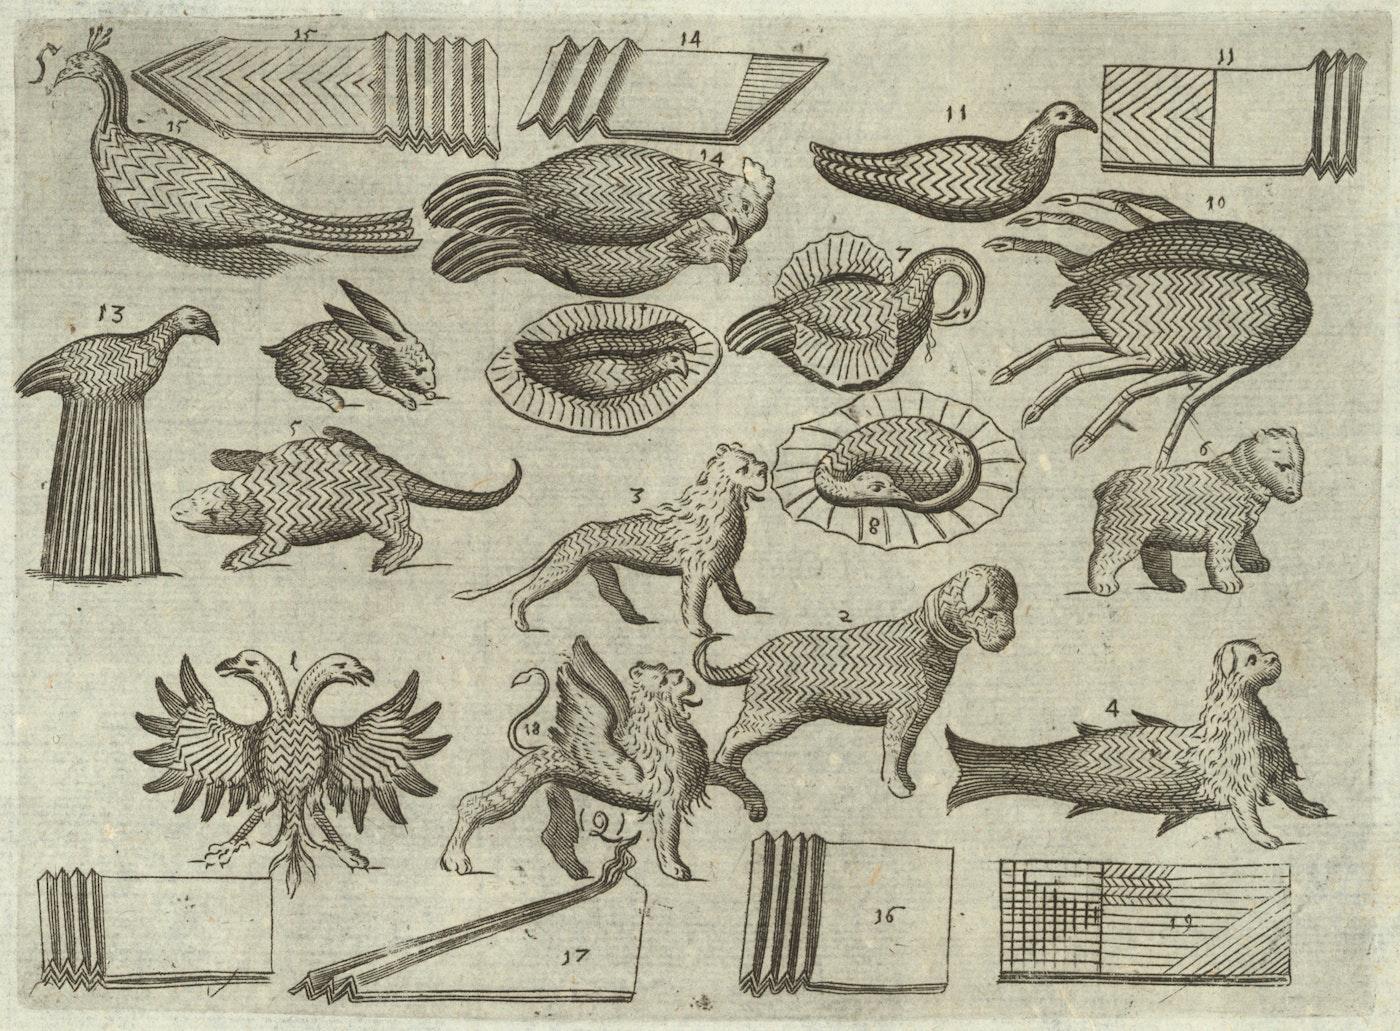 Serviette Sculptures Mattia Giegher S Treatise On Napkin Folding 1629 The Public Domain Review